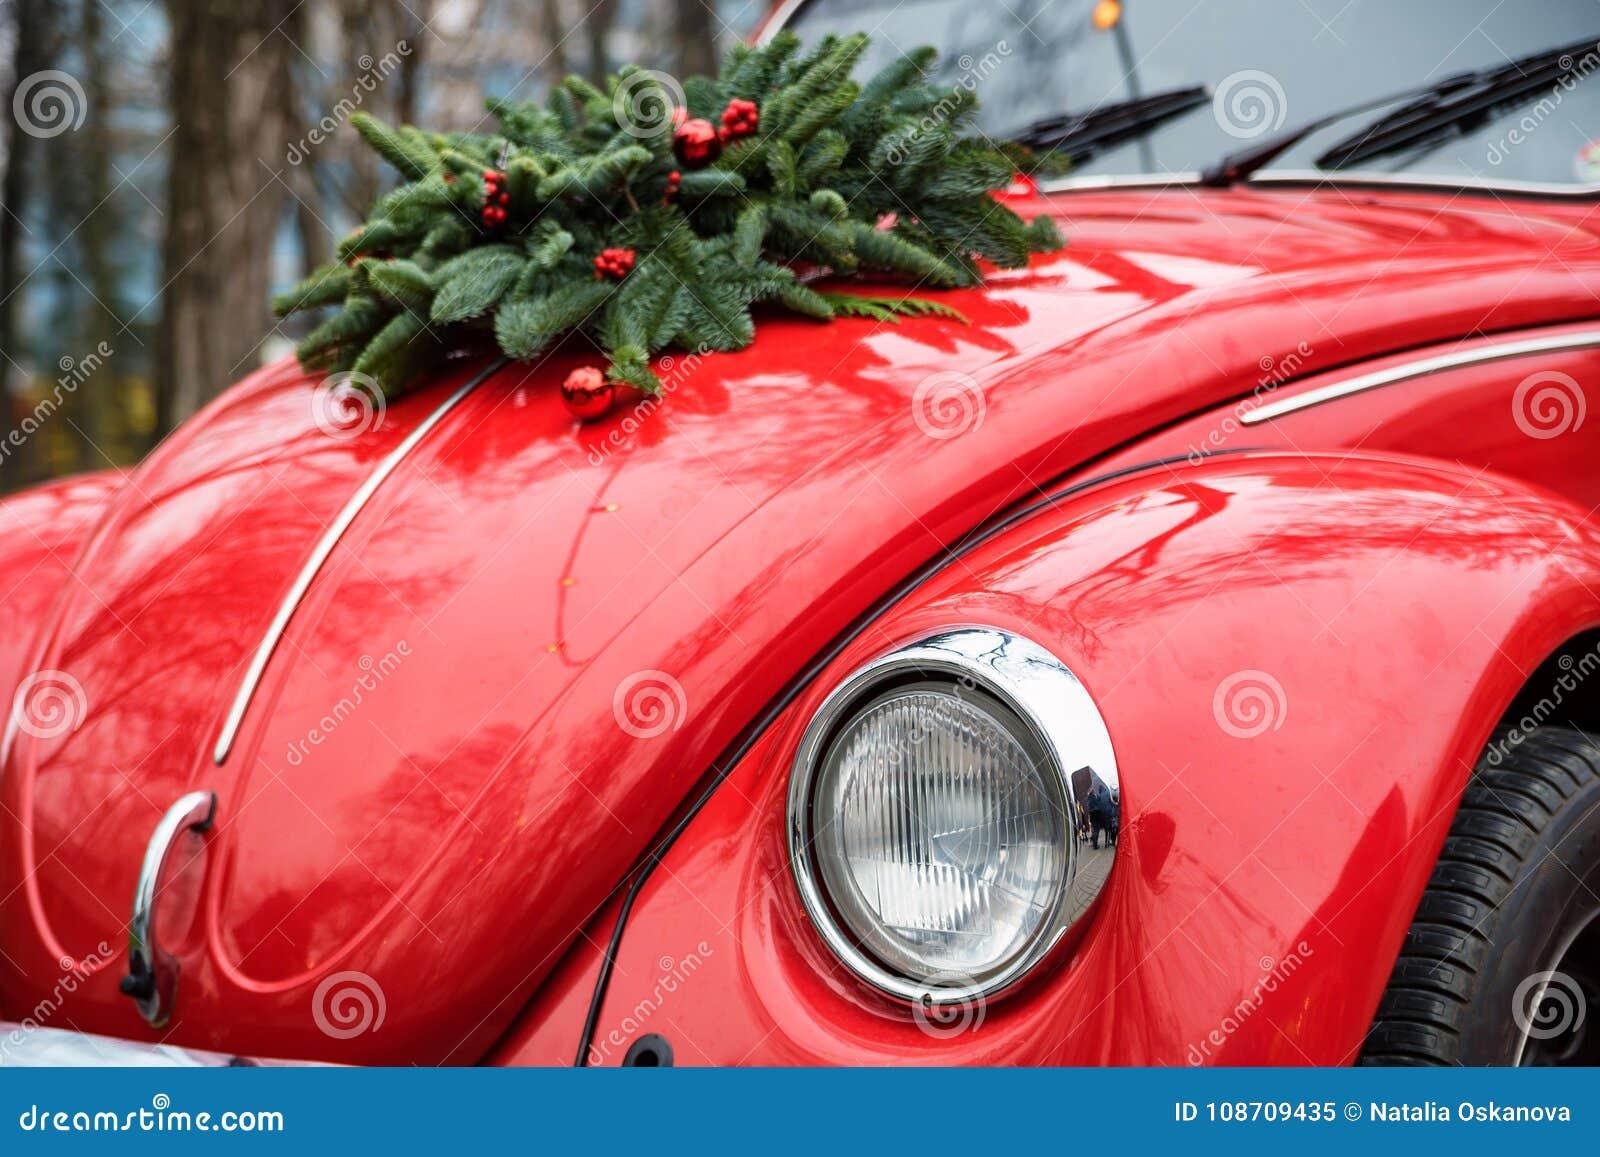 Close up Christmas wreath on red retro car